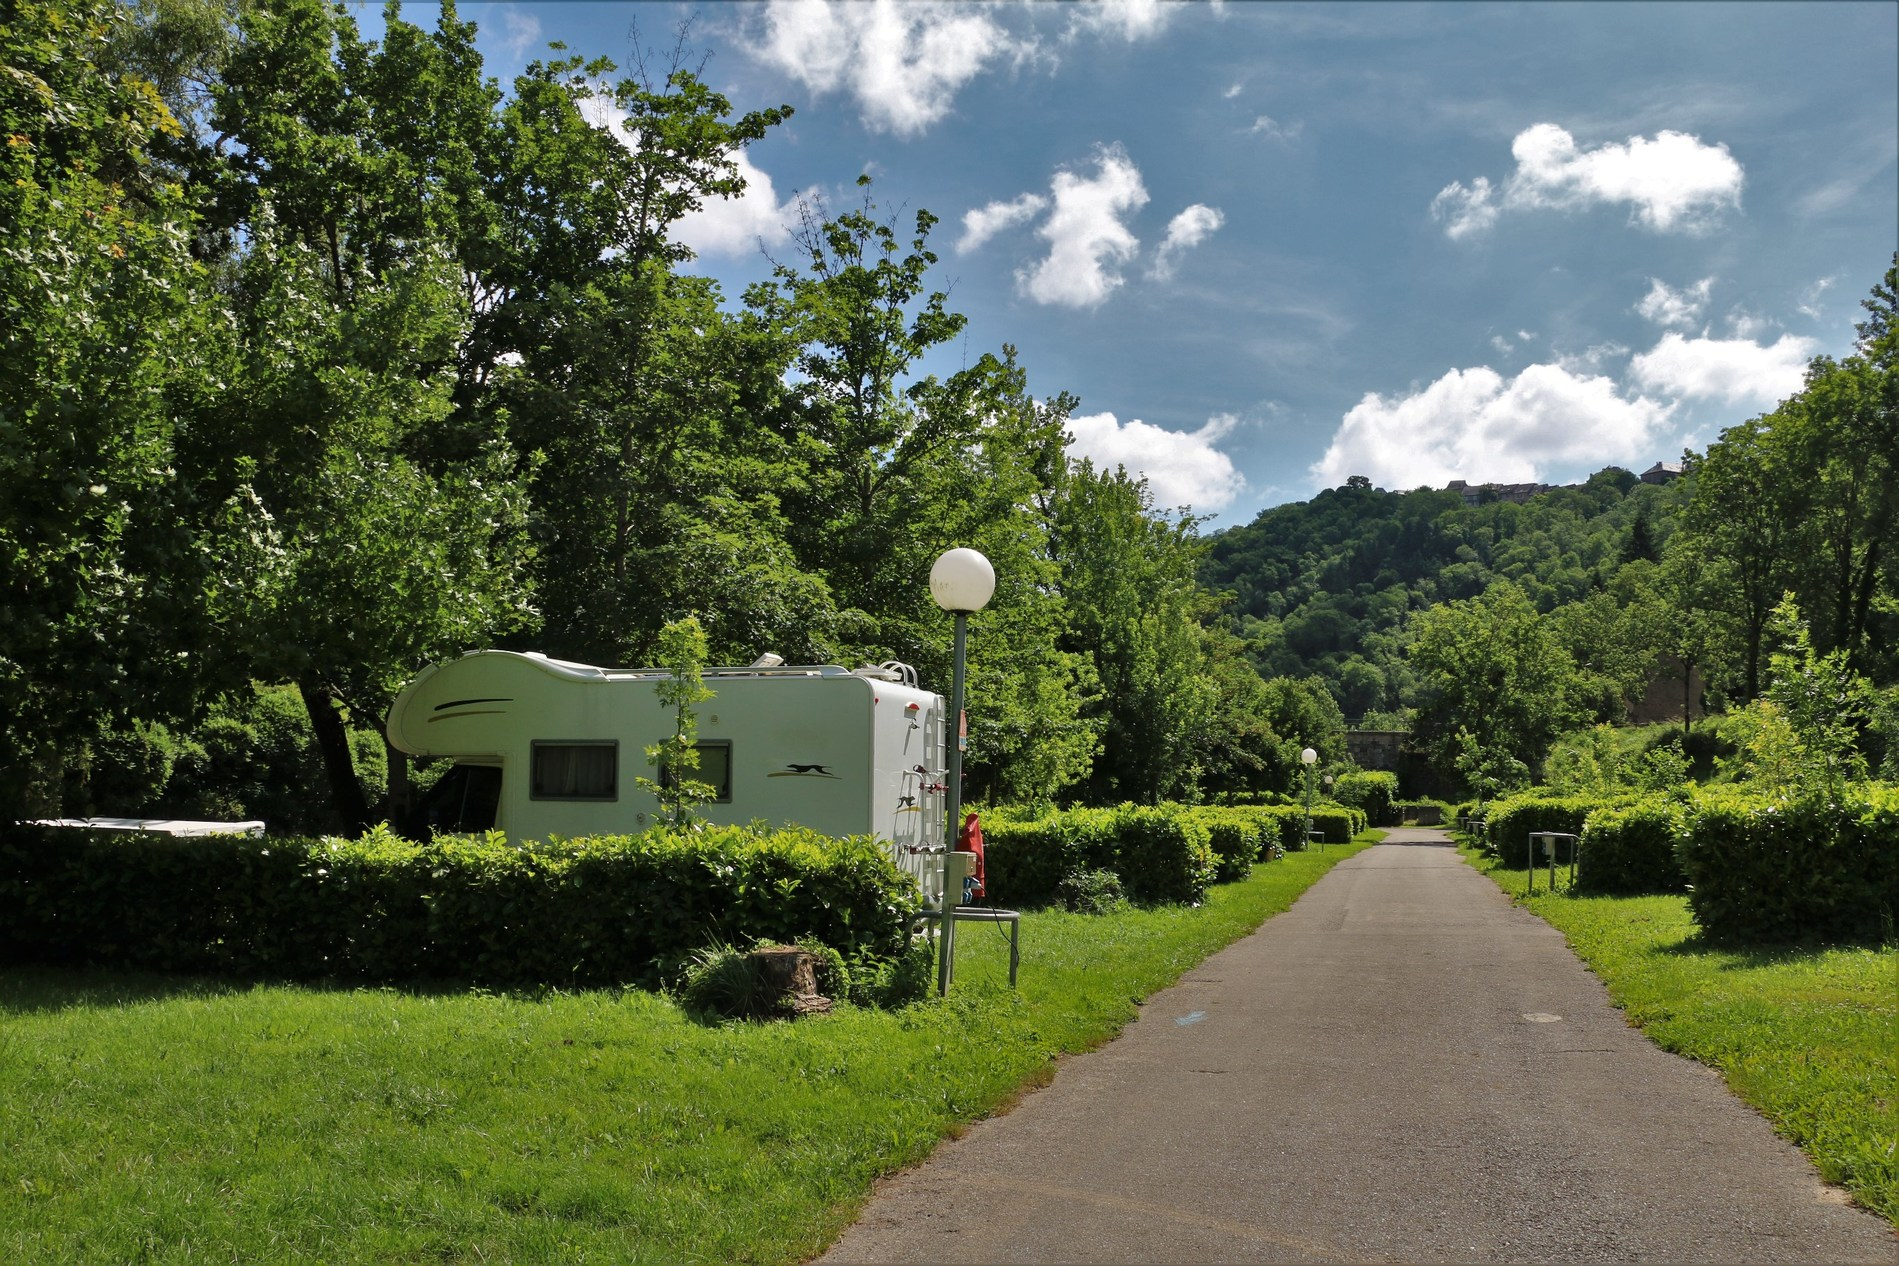 Frankrijk-Najac-Camping%20Le%20Paisserou-ExtraLarge Wintersport Frankrijk